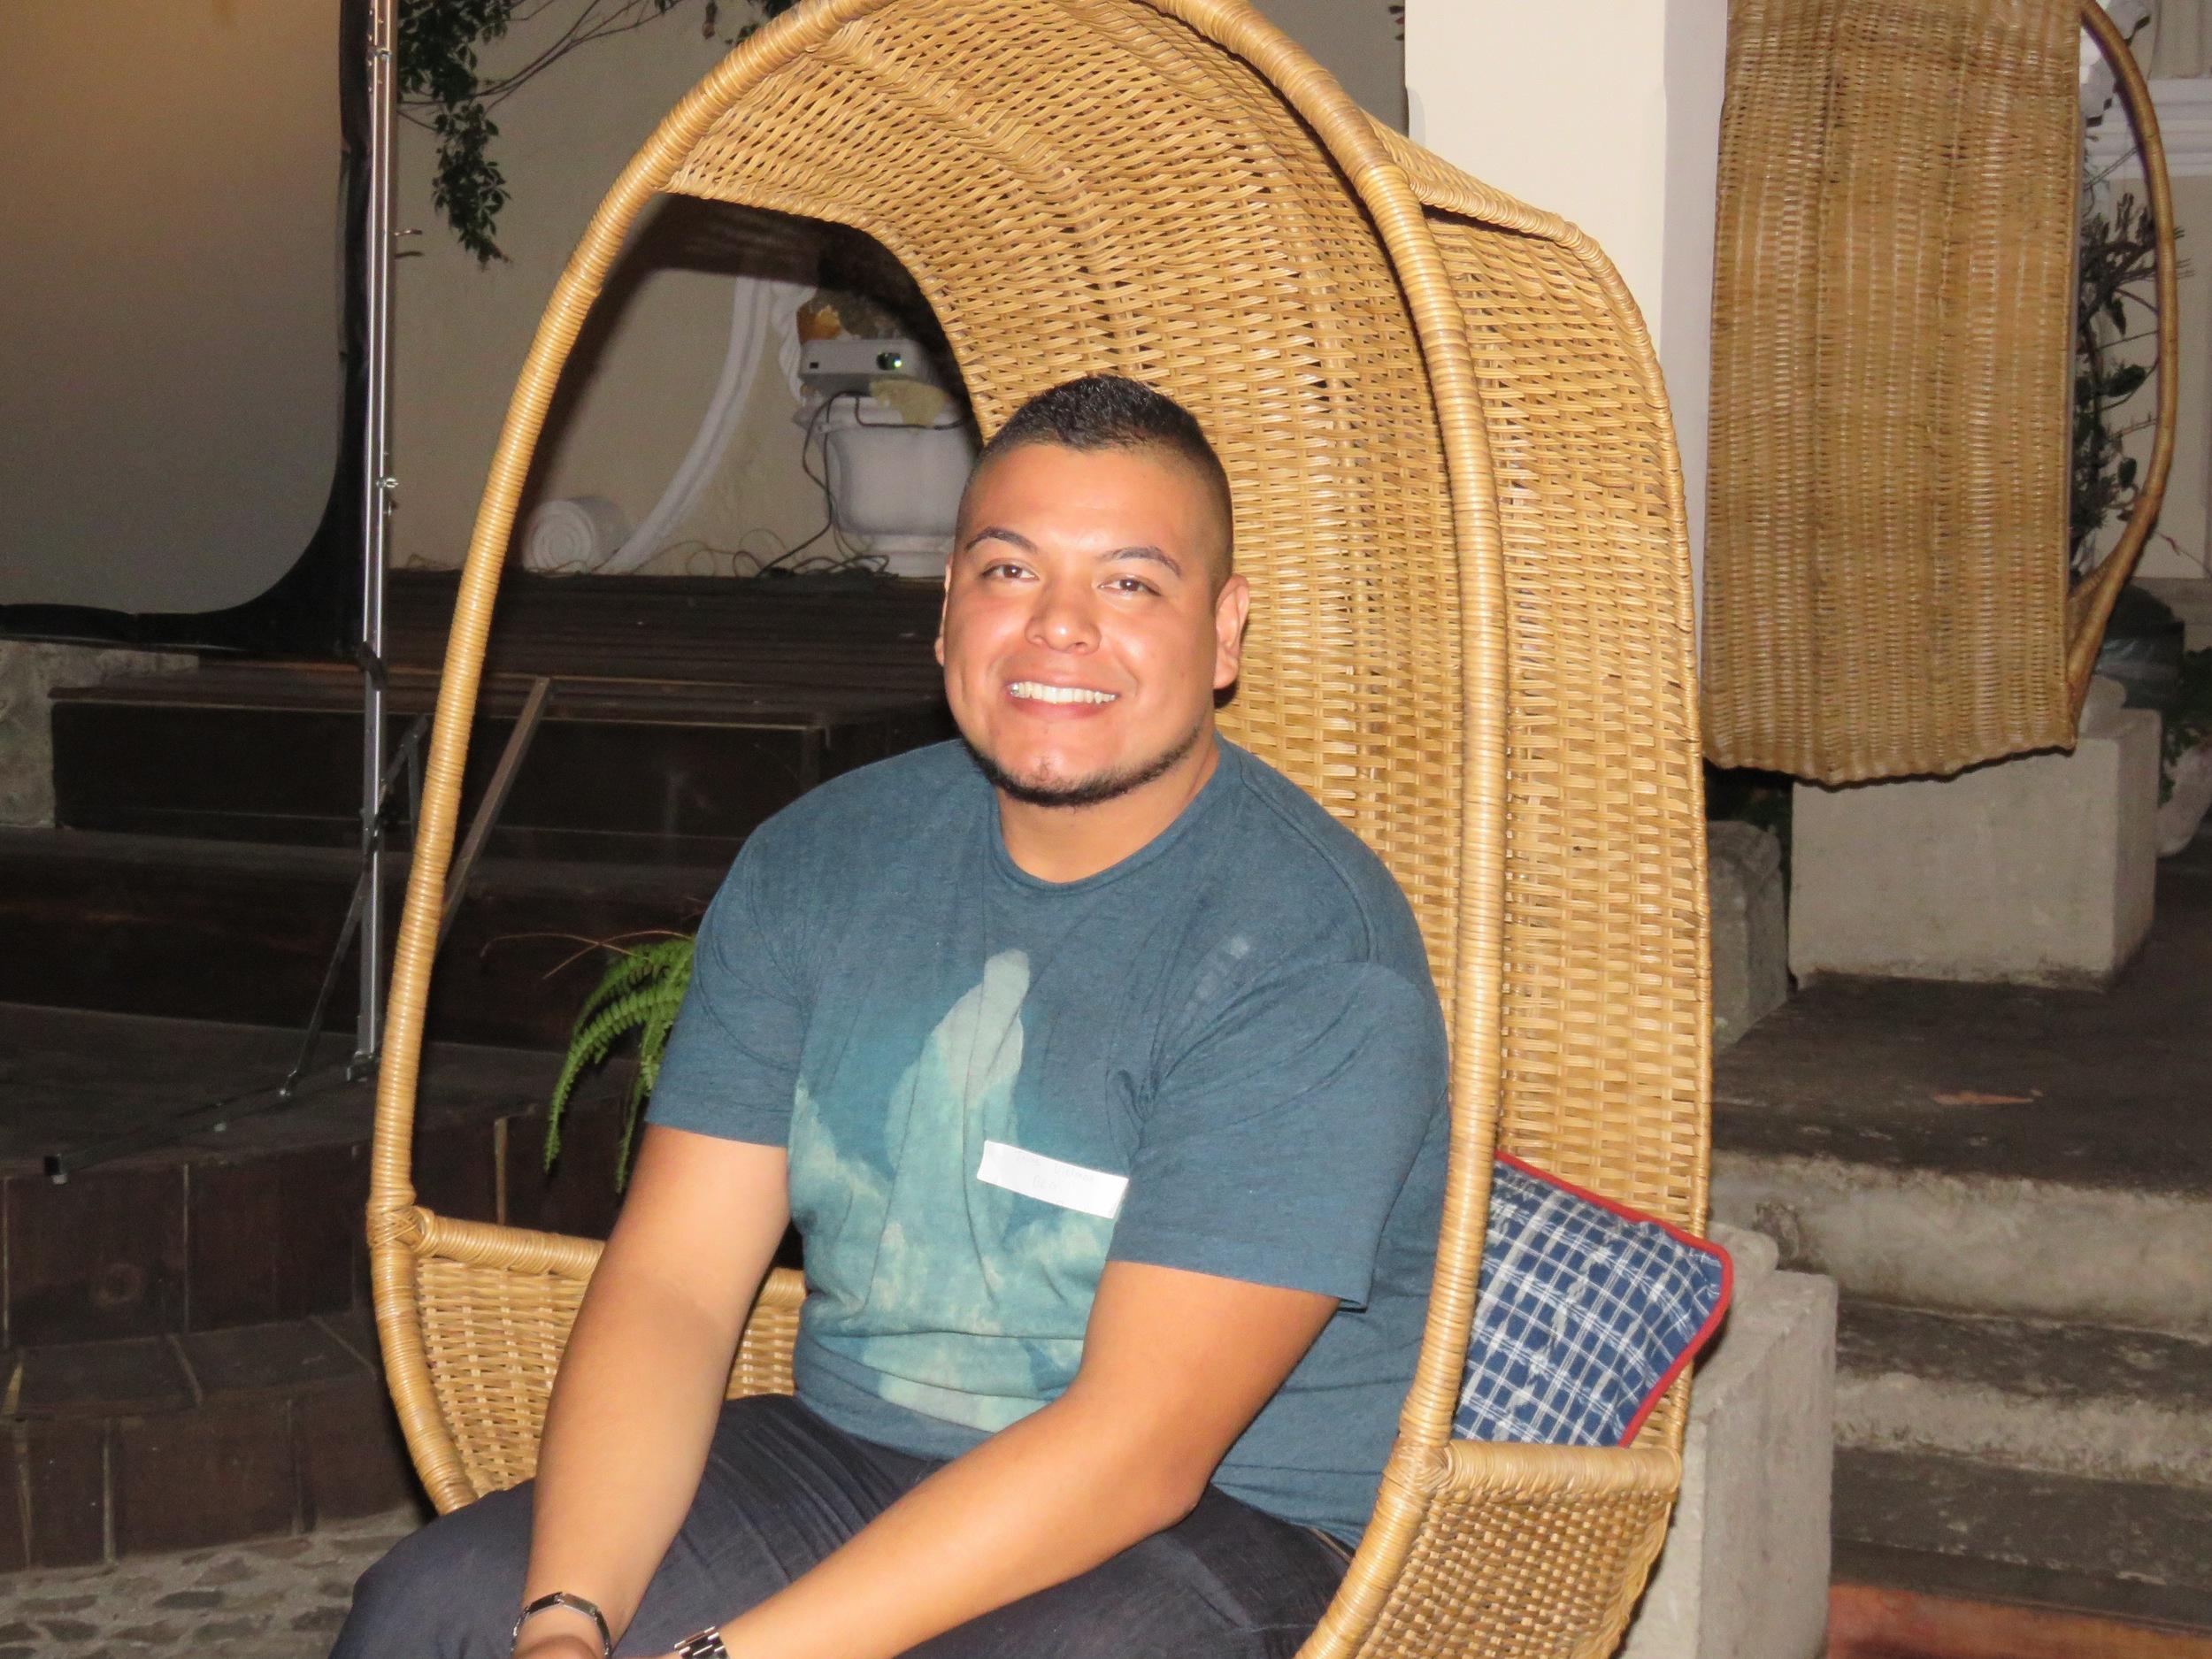 guy smiling in wicker chair